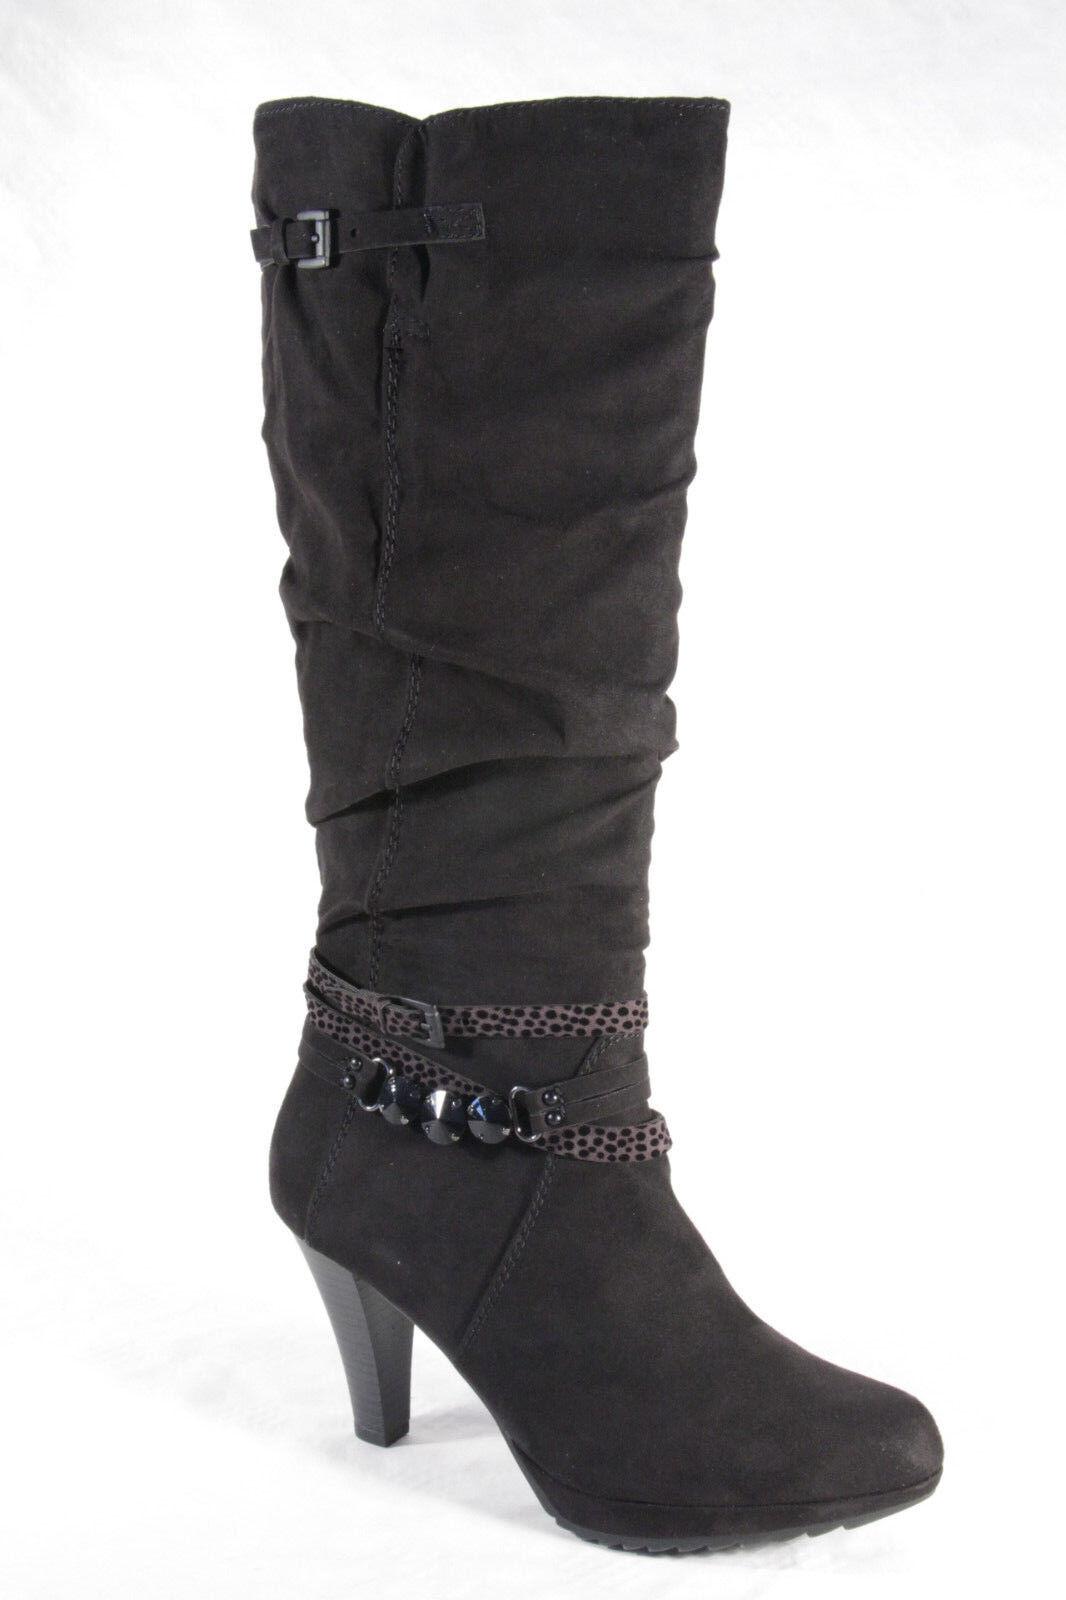 Marco Mujer, Tozzi 25509 botas Mujer, Marco Botines, botas Negro 25509 Nuevo 092ec1